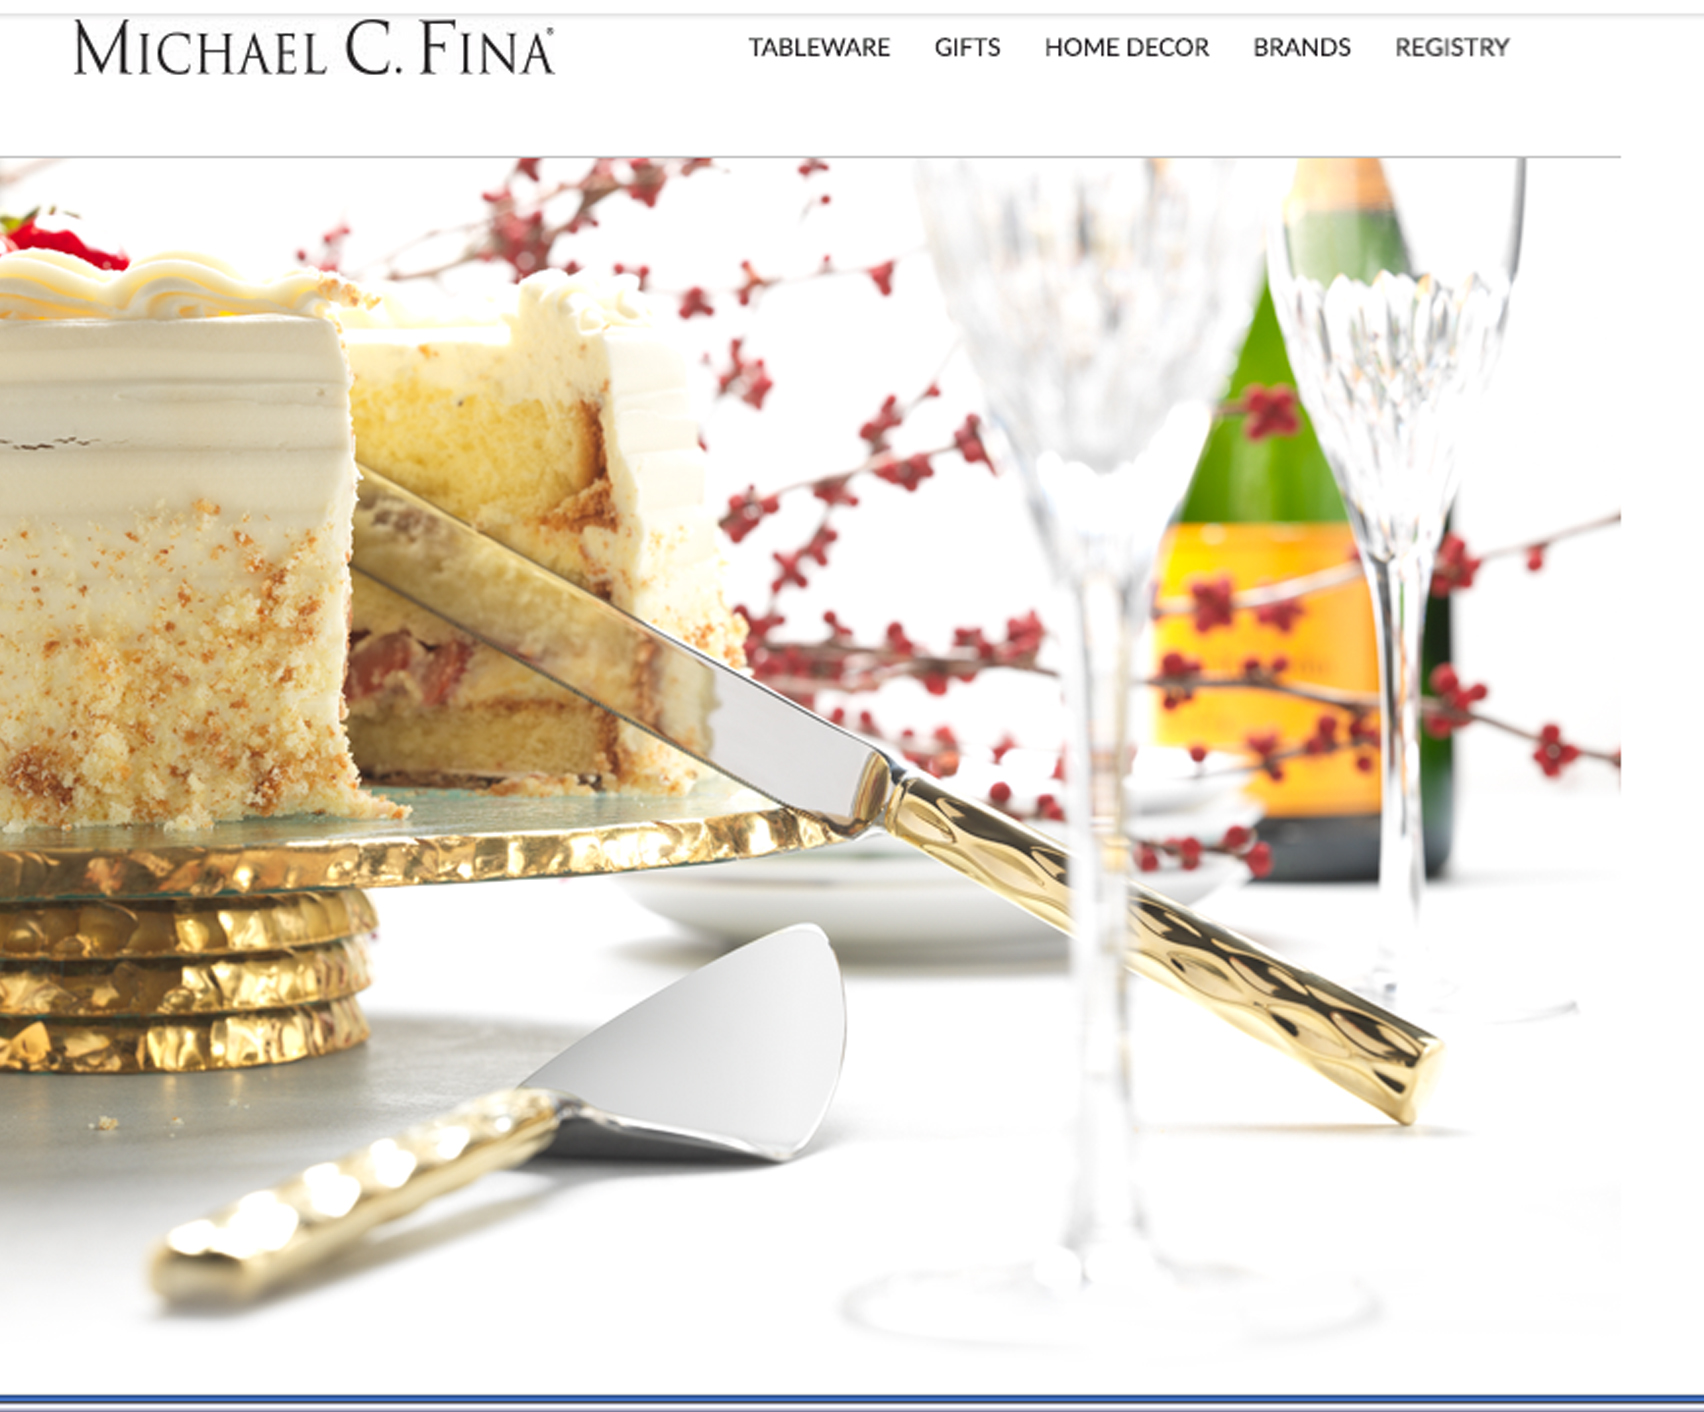 MC Fina truro gold cake set email .jpg